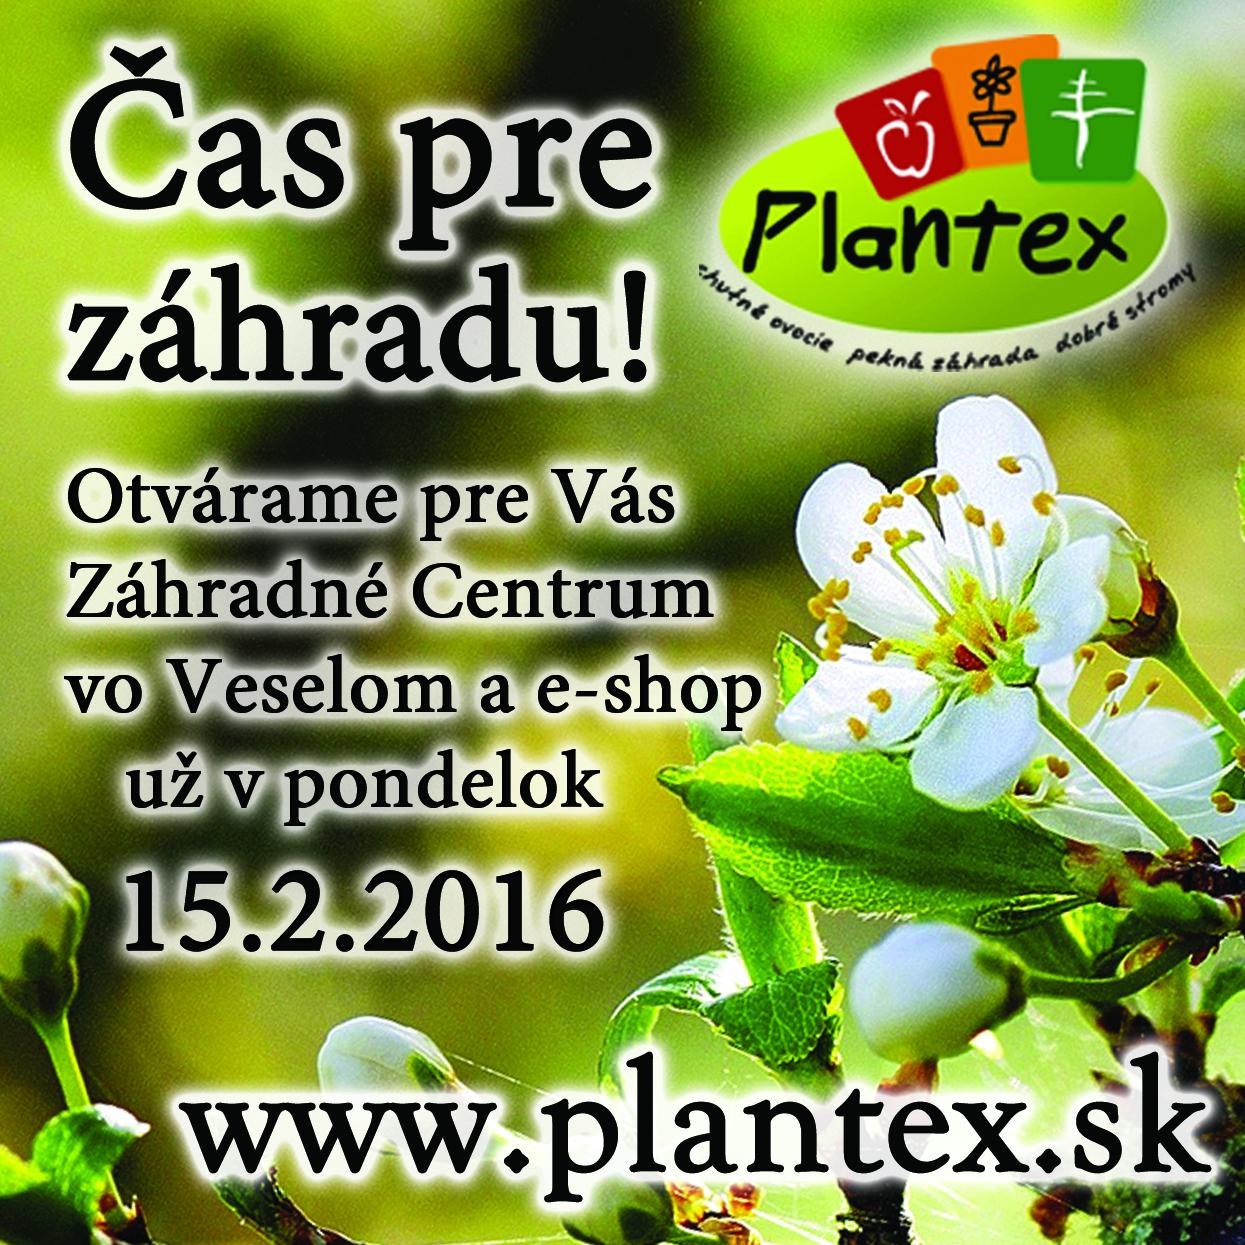 Plantex vseobecny